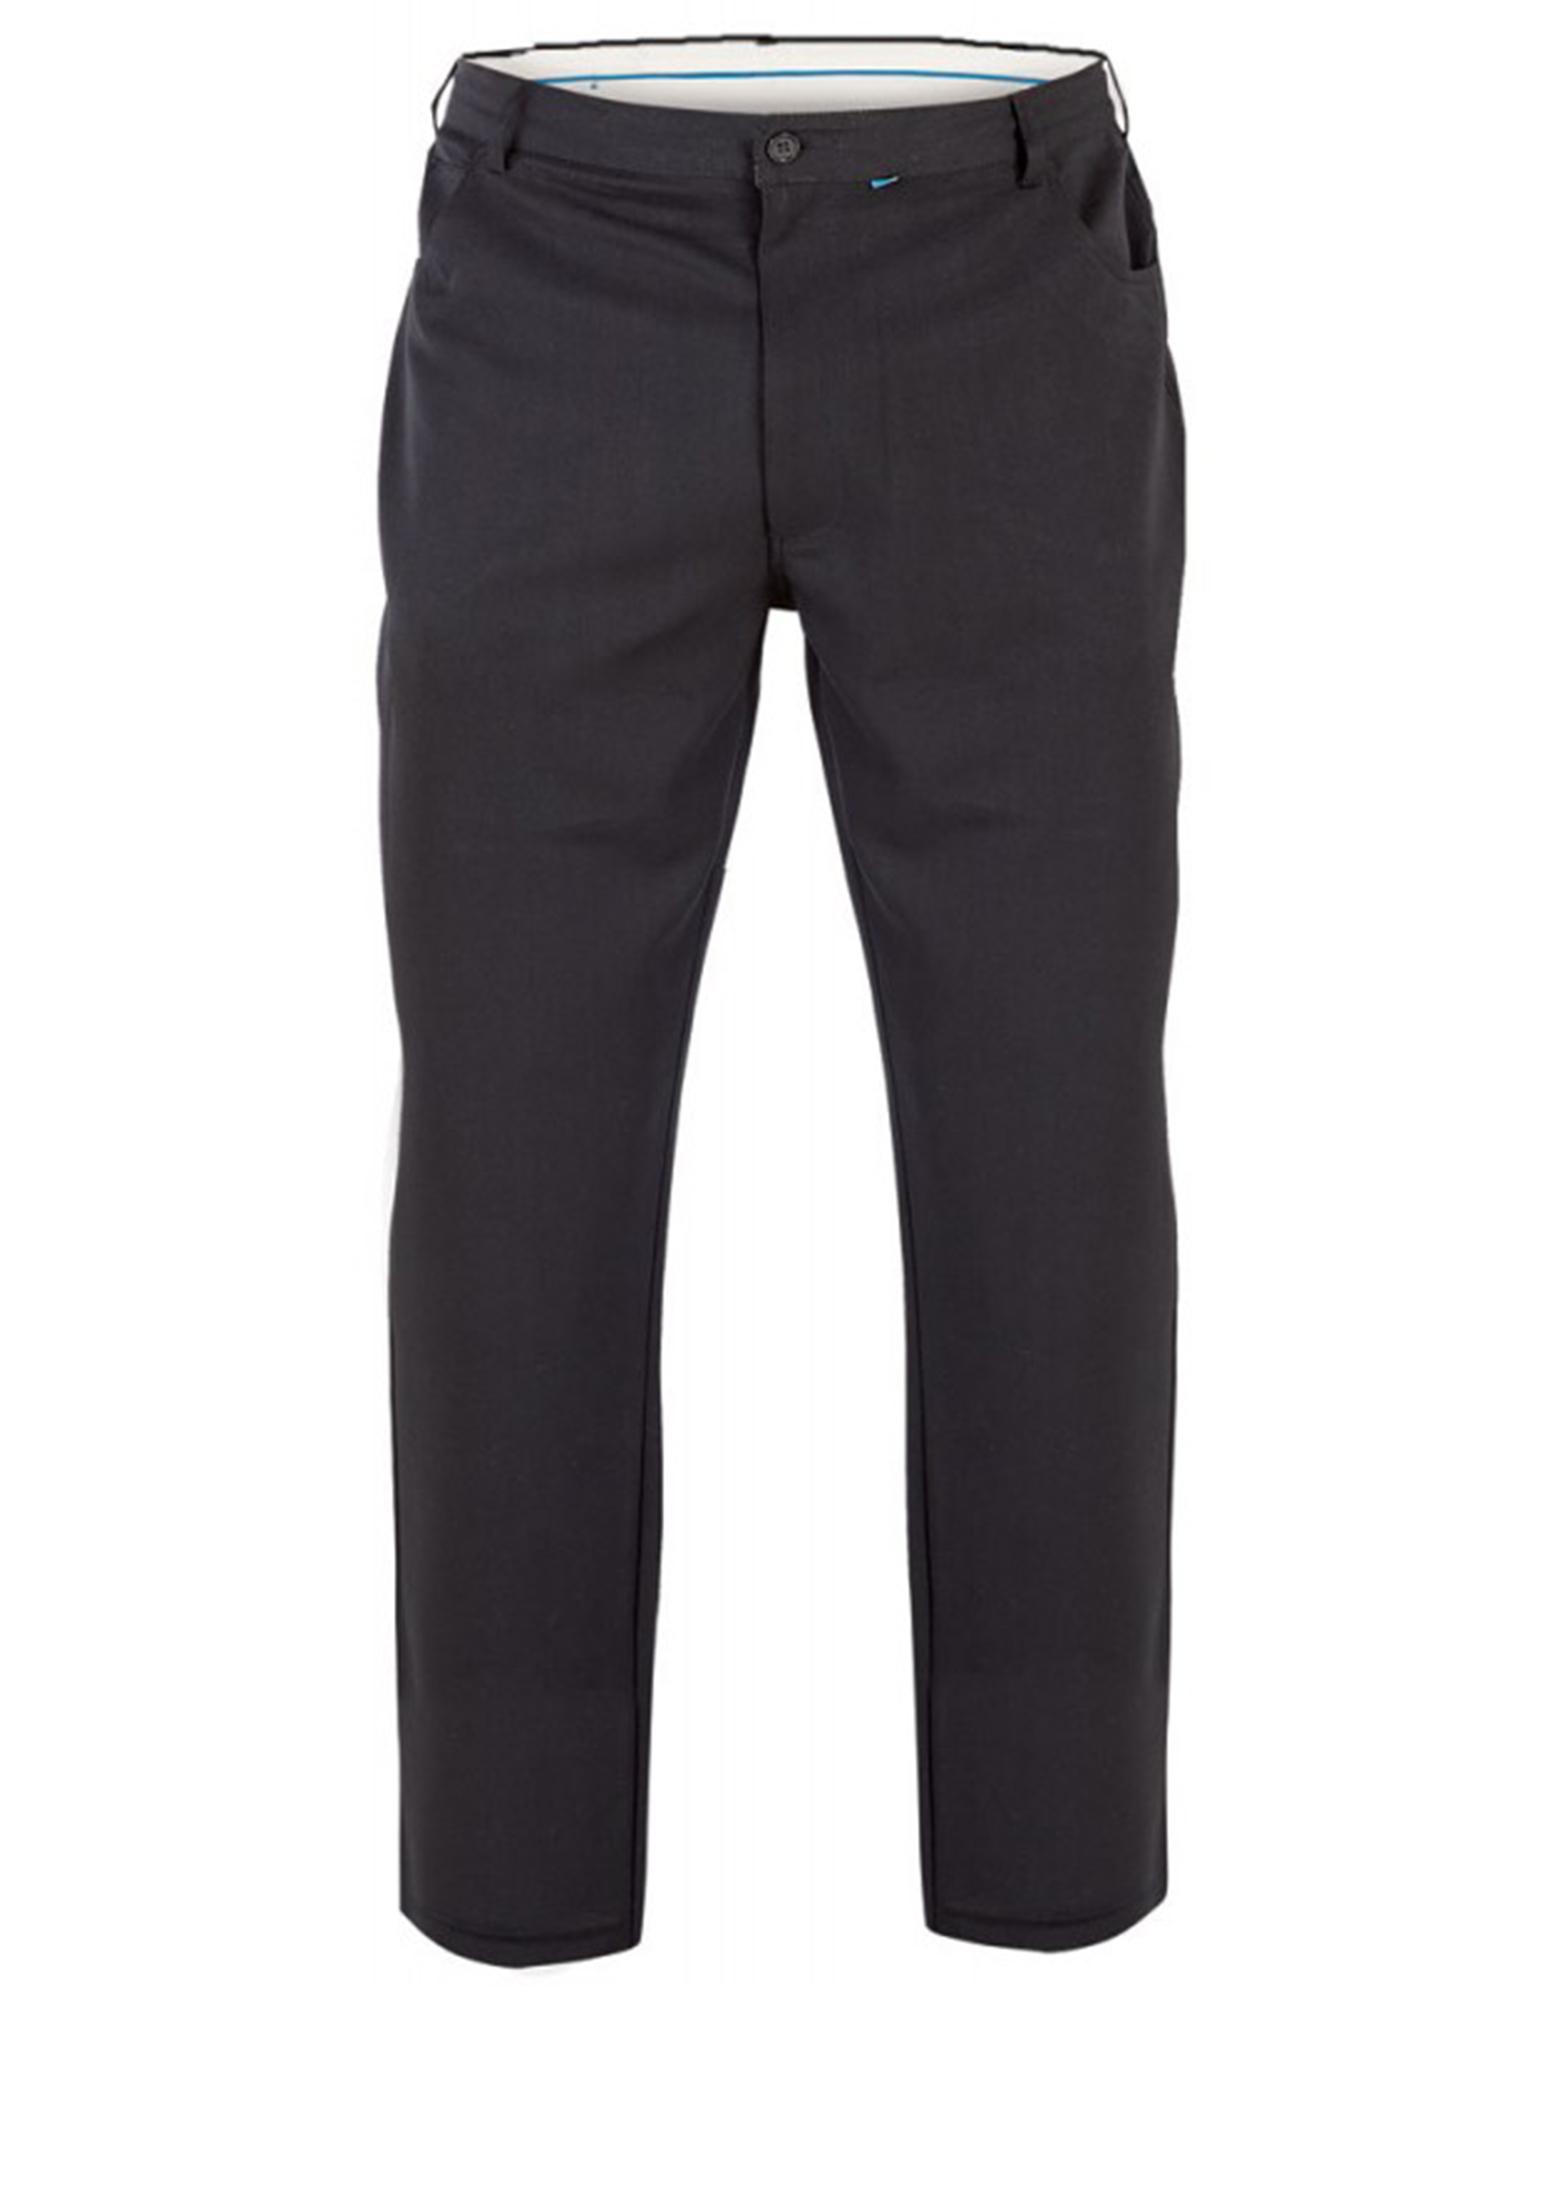 Pantalon met rits/knoopsluiting, 2 steekzakken en 1 muntzakje voor, 2 achterzakken, klein logo op de rechter achterzak. Beschikbare lengte: 34 Inch